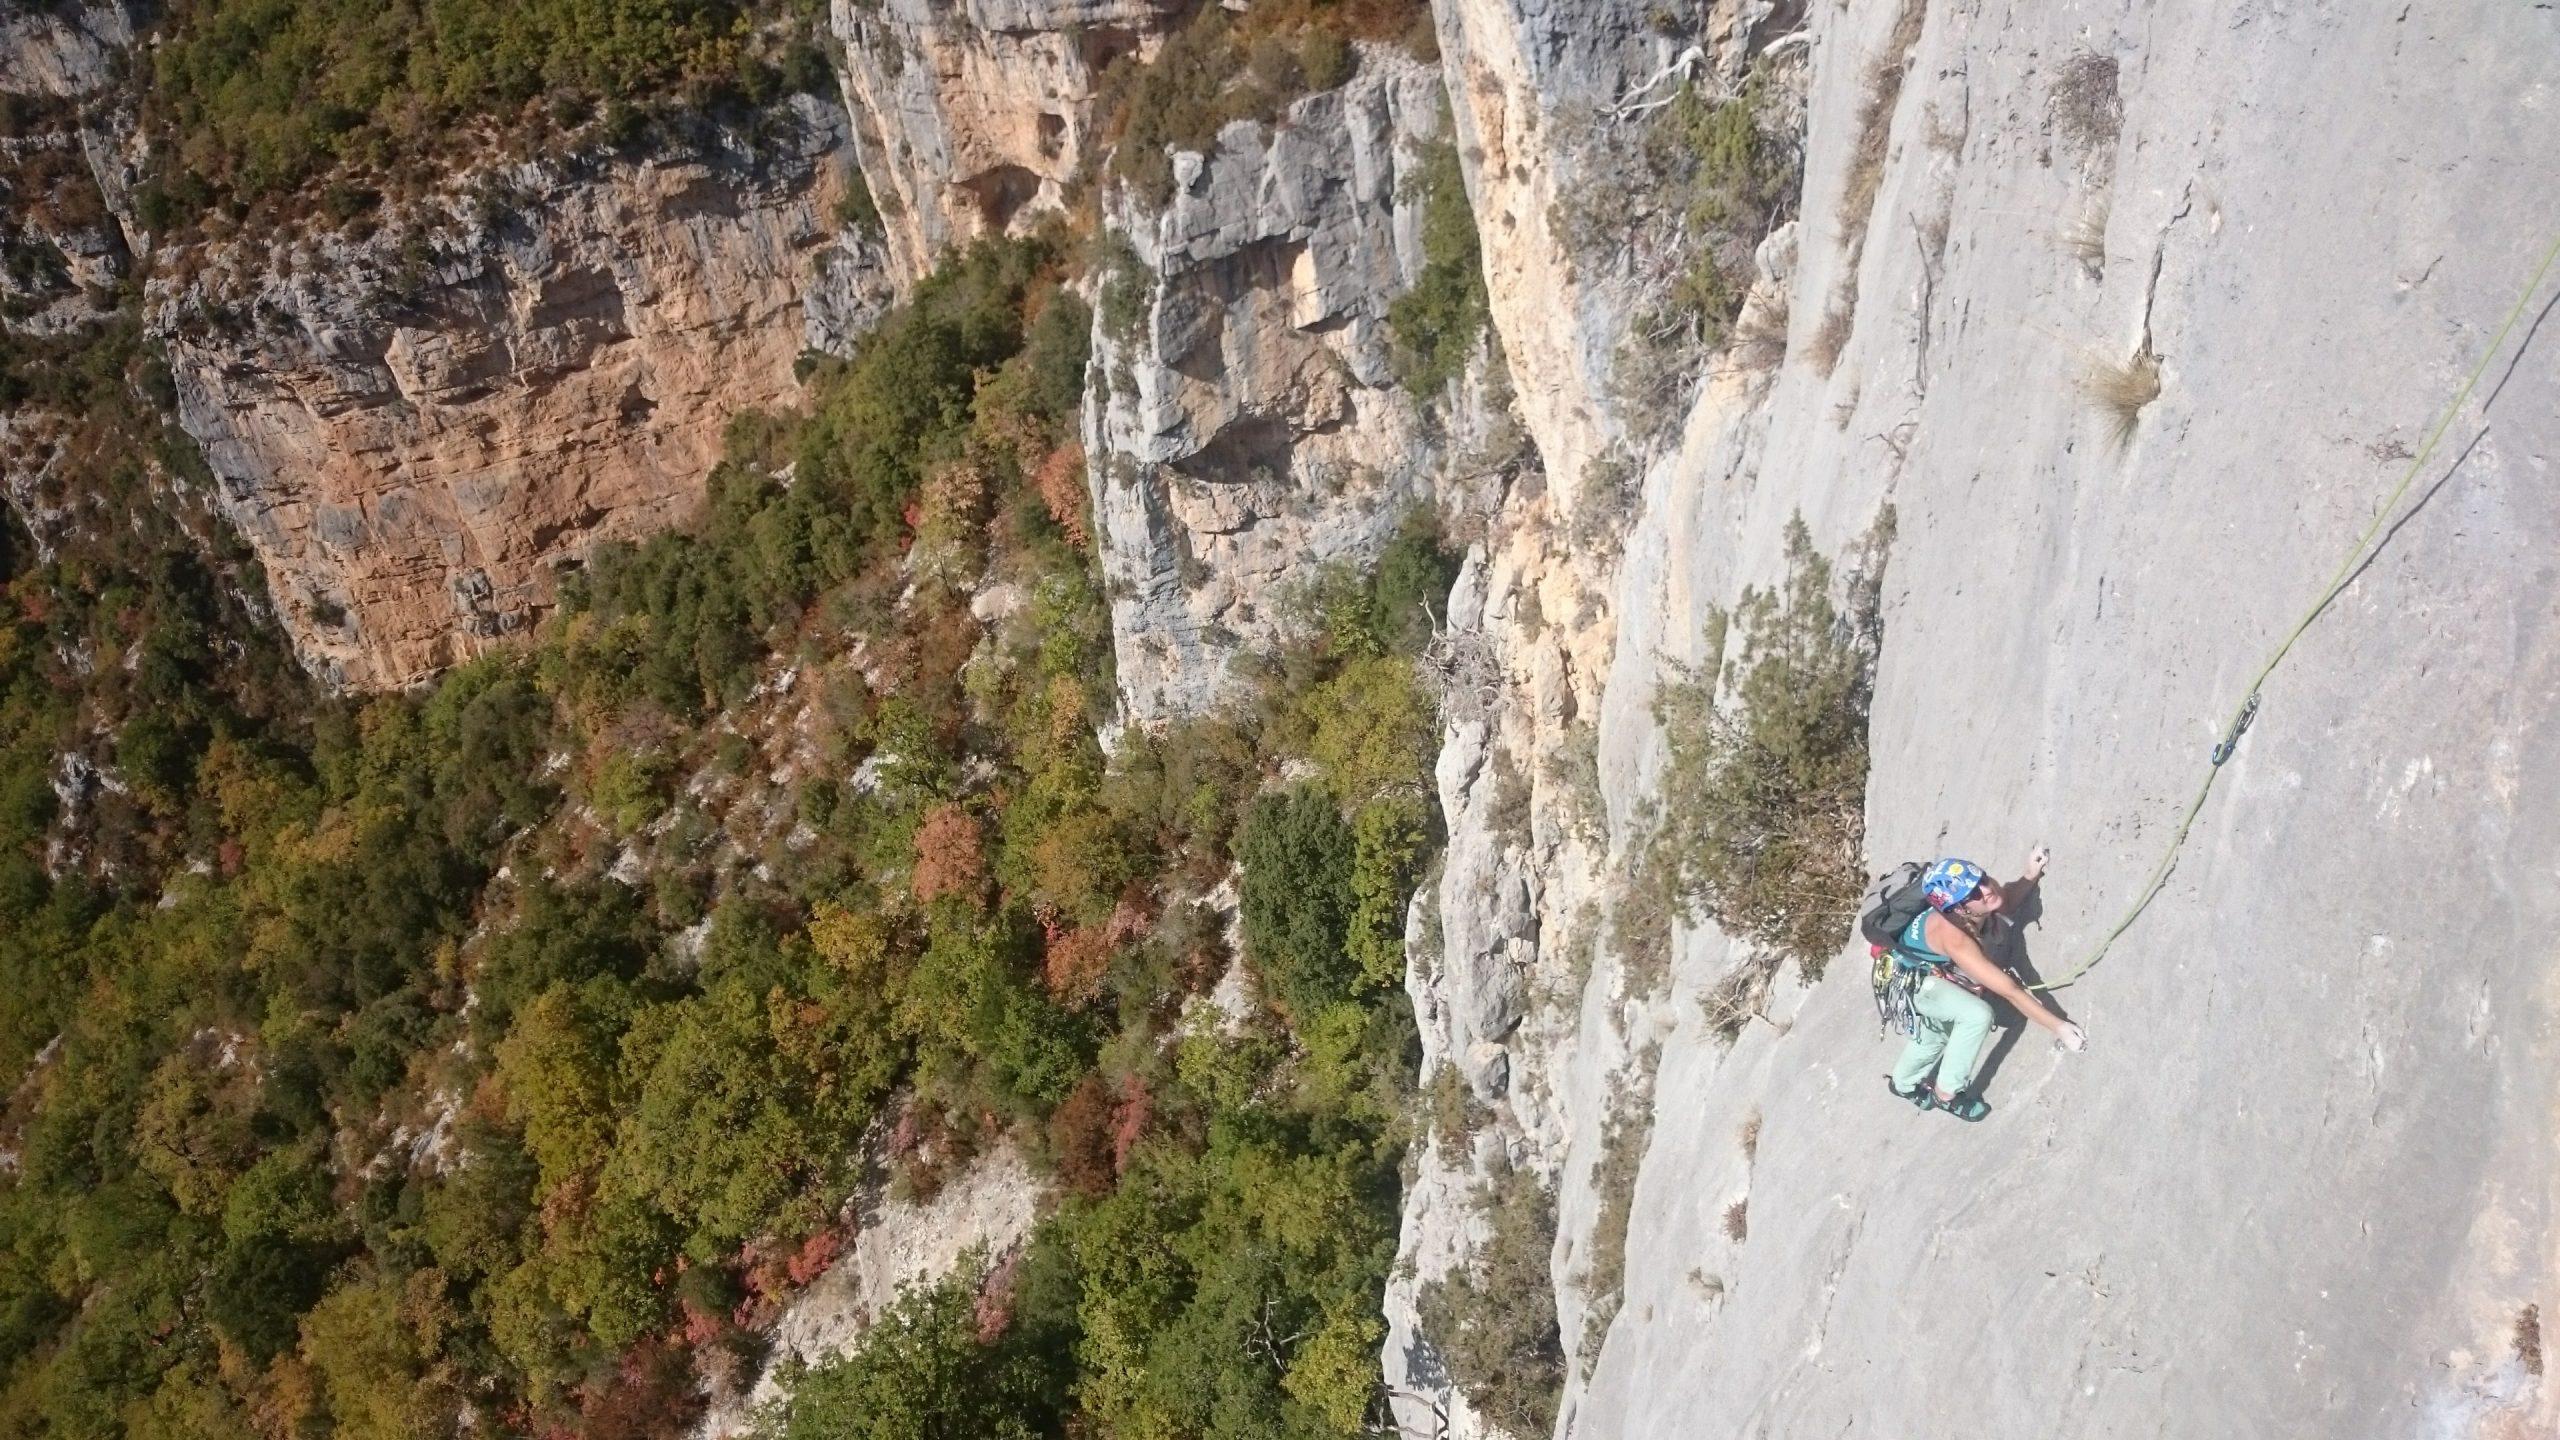 Danny Dannywg climbing